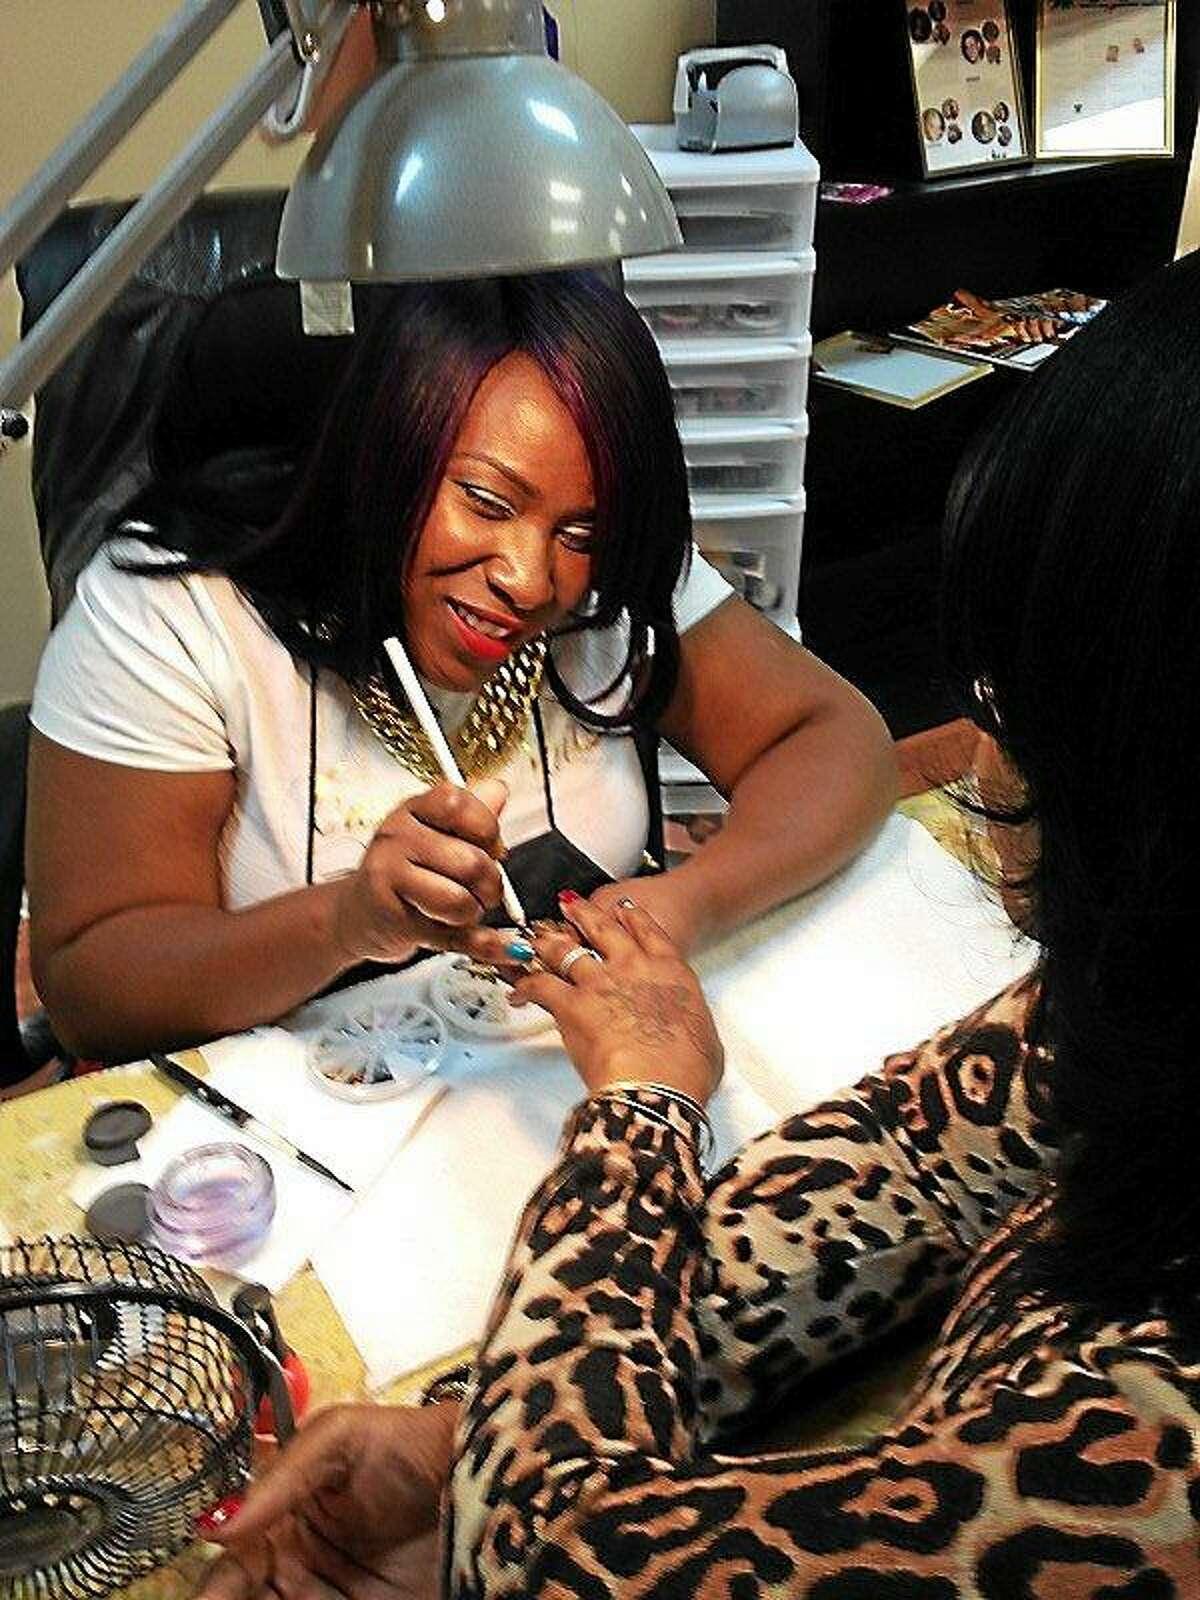 Nail stylist Temeka Jackson works on a unique nail design for regular customer Keisha Edwards.